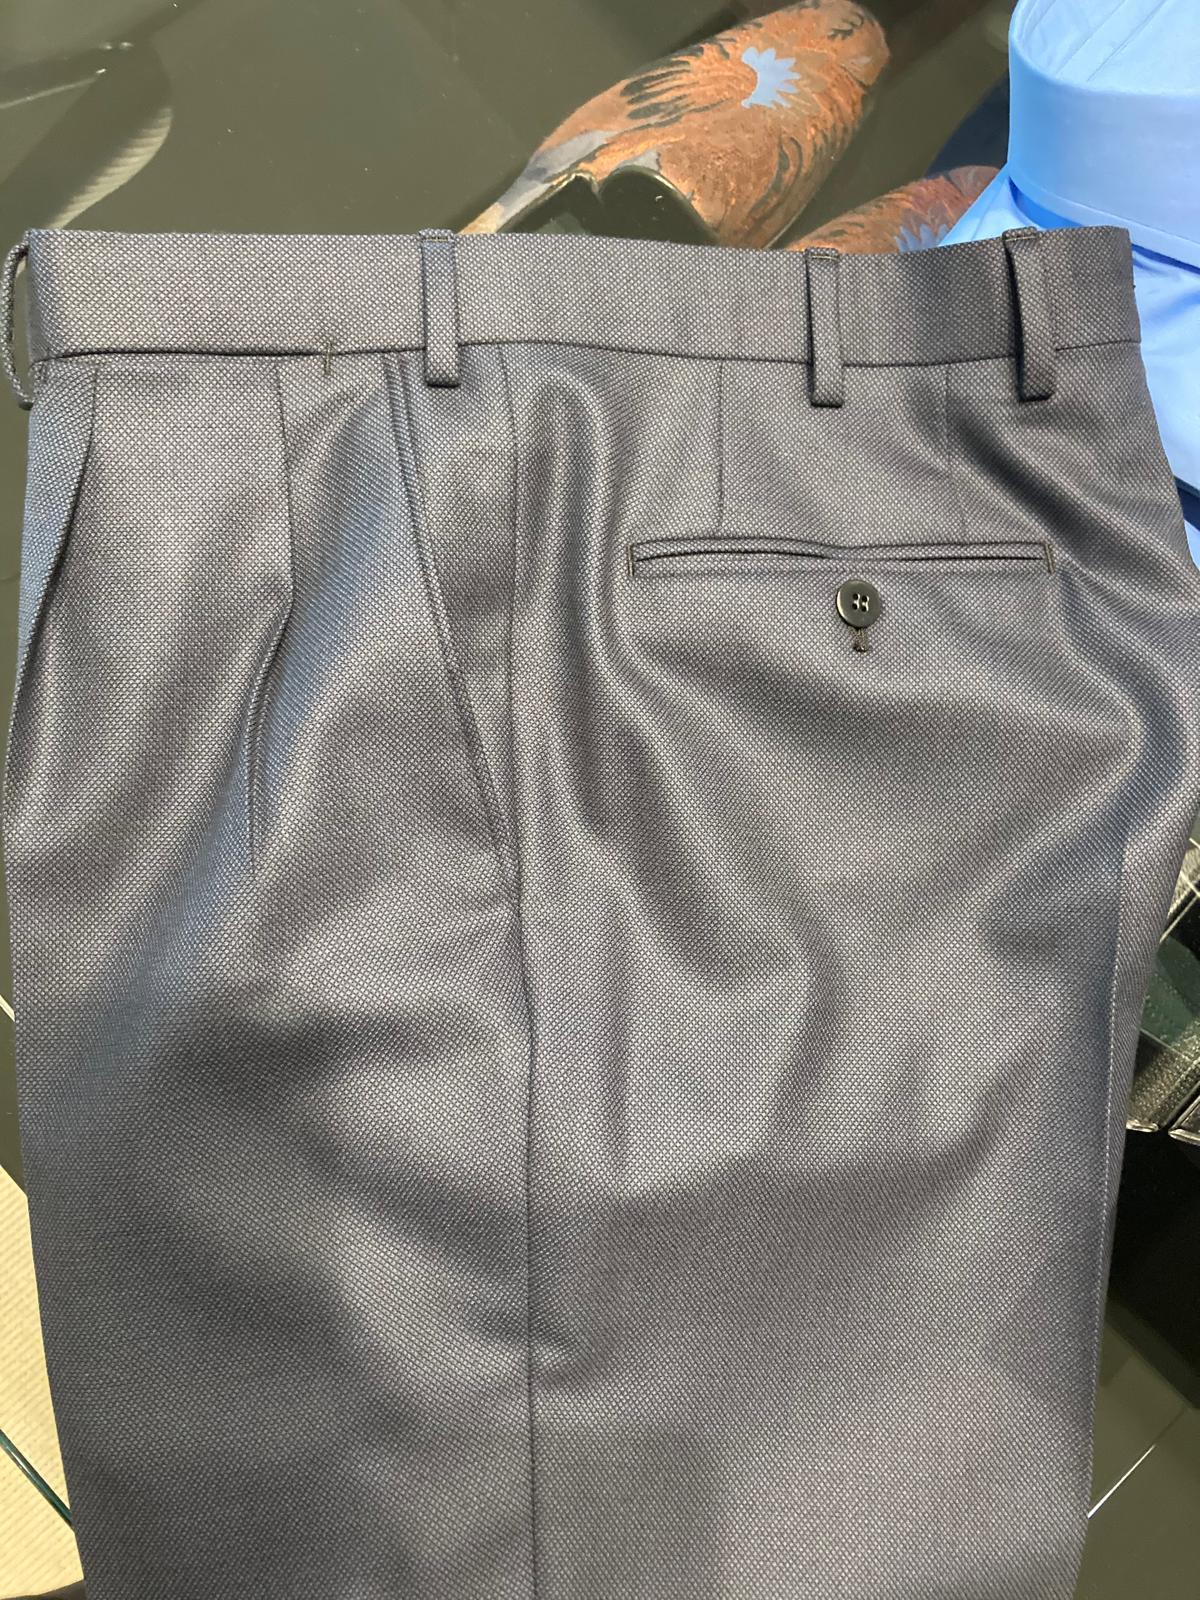 Brioni Bespoke trousers